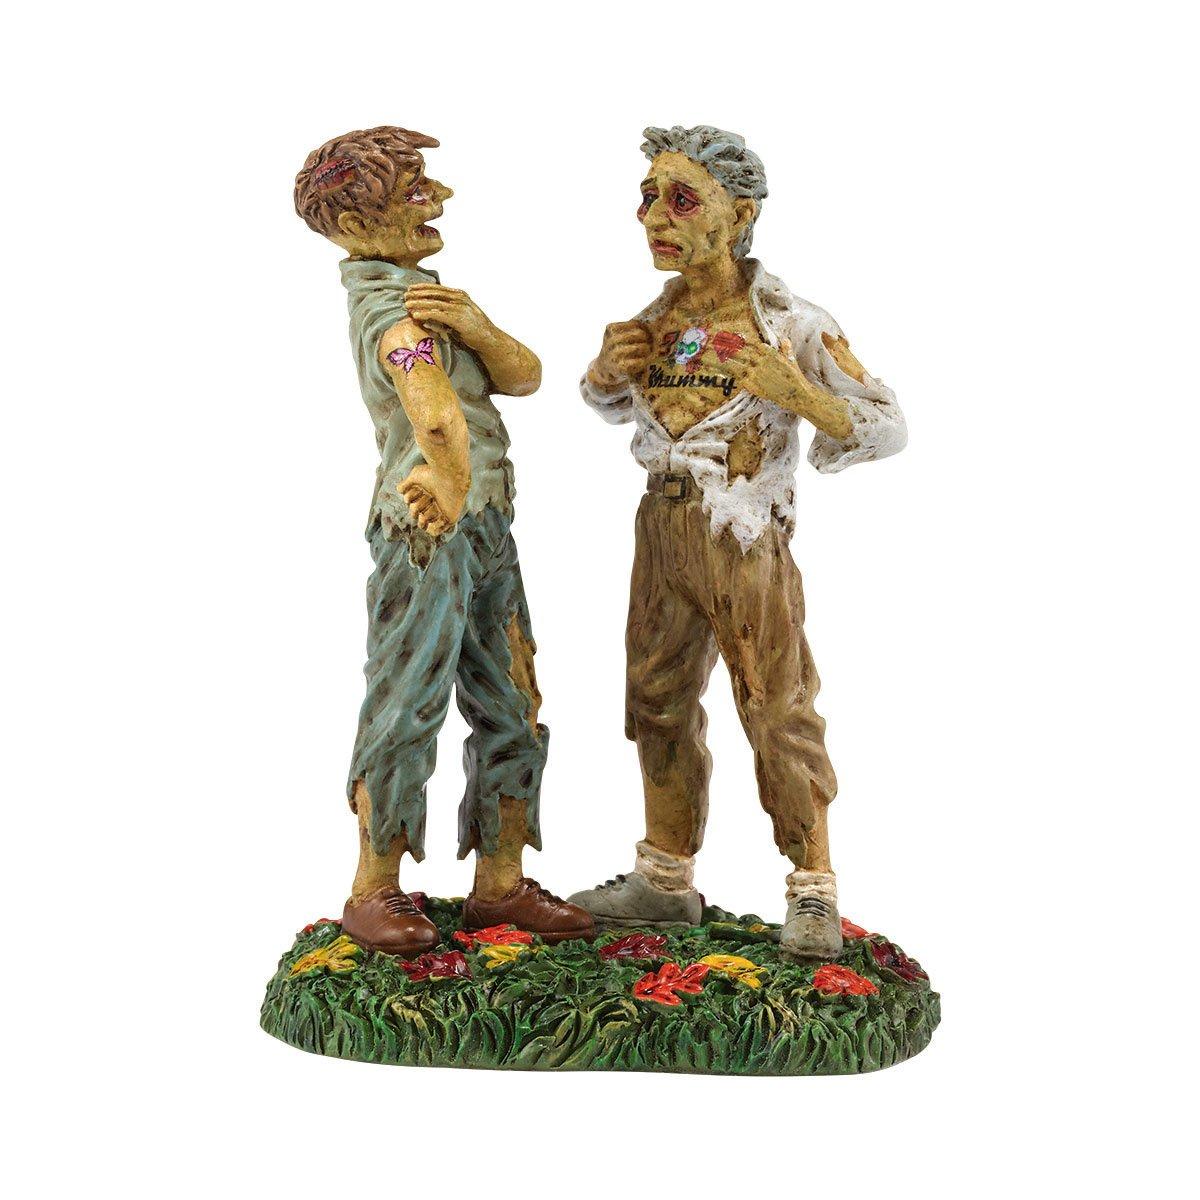 Department 56 Snow Village Halloween Ink Scare Accessory Figurine, 1.97 inch (4036596)